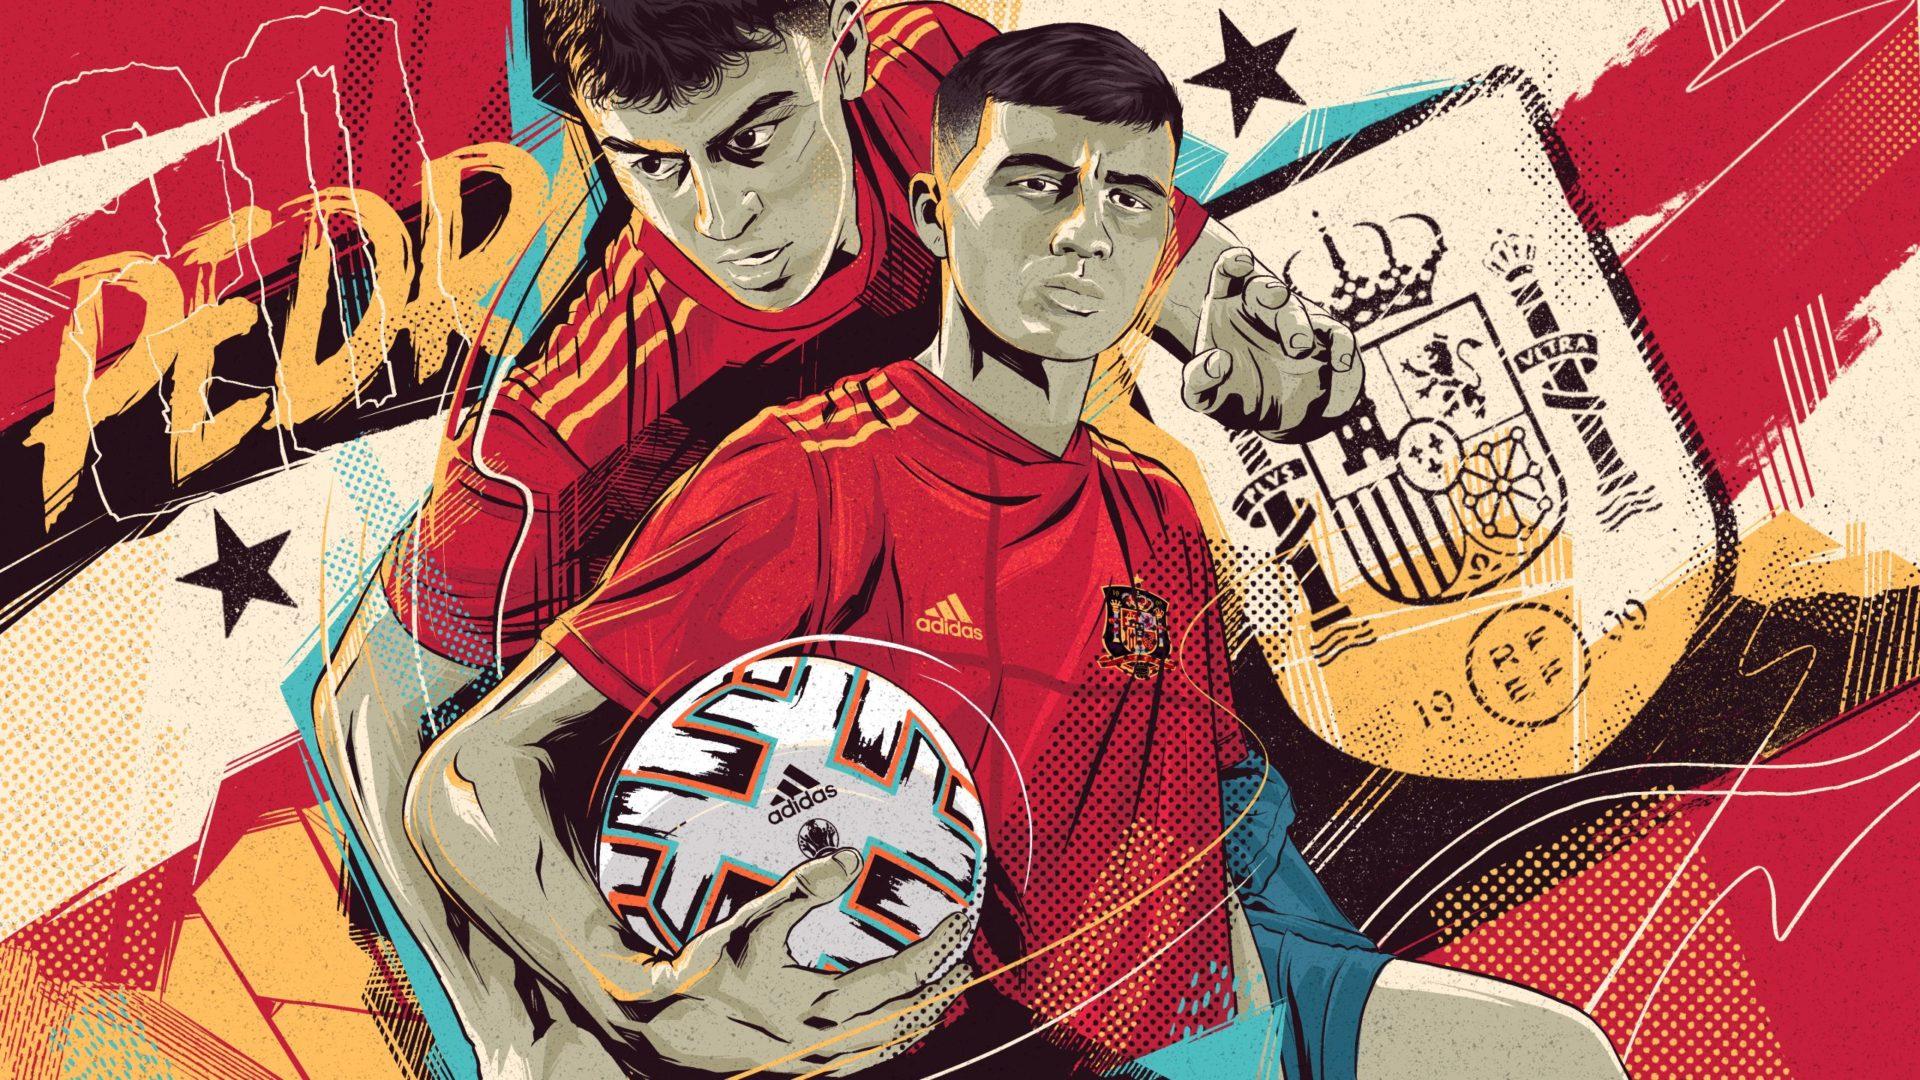 Can Spain reach finals of euro 2020?